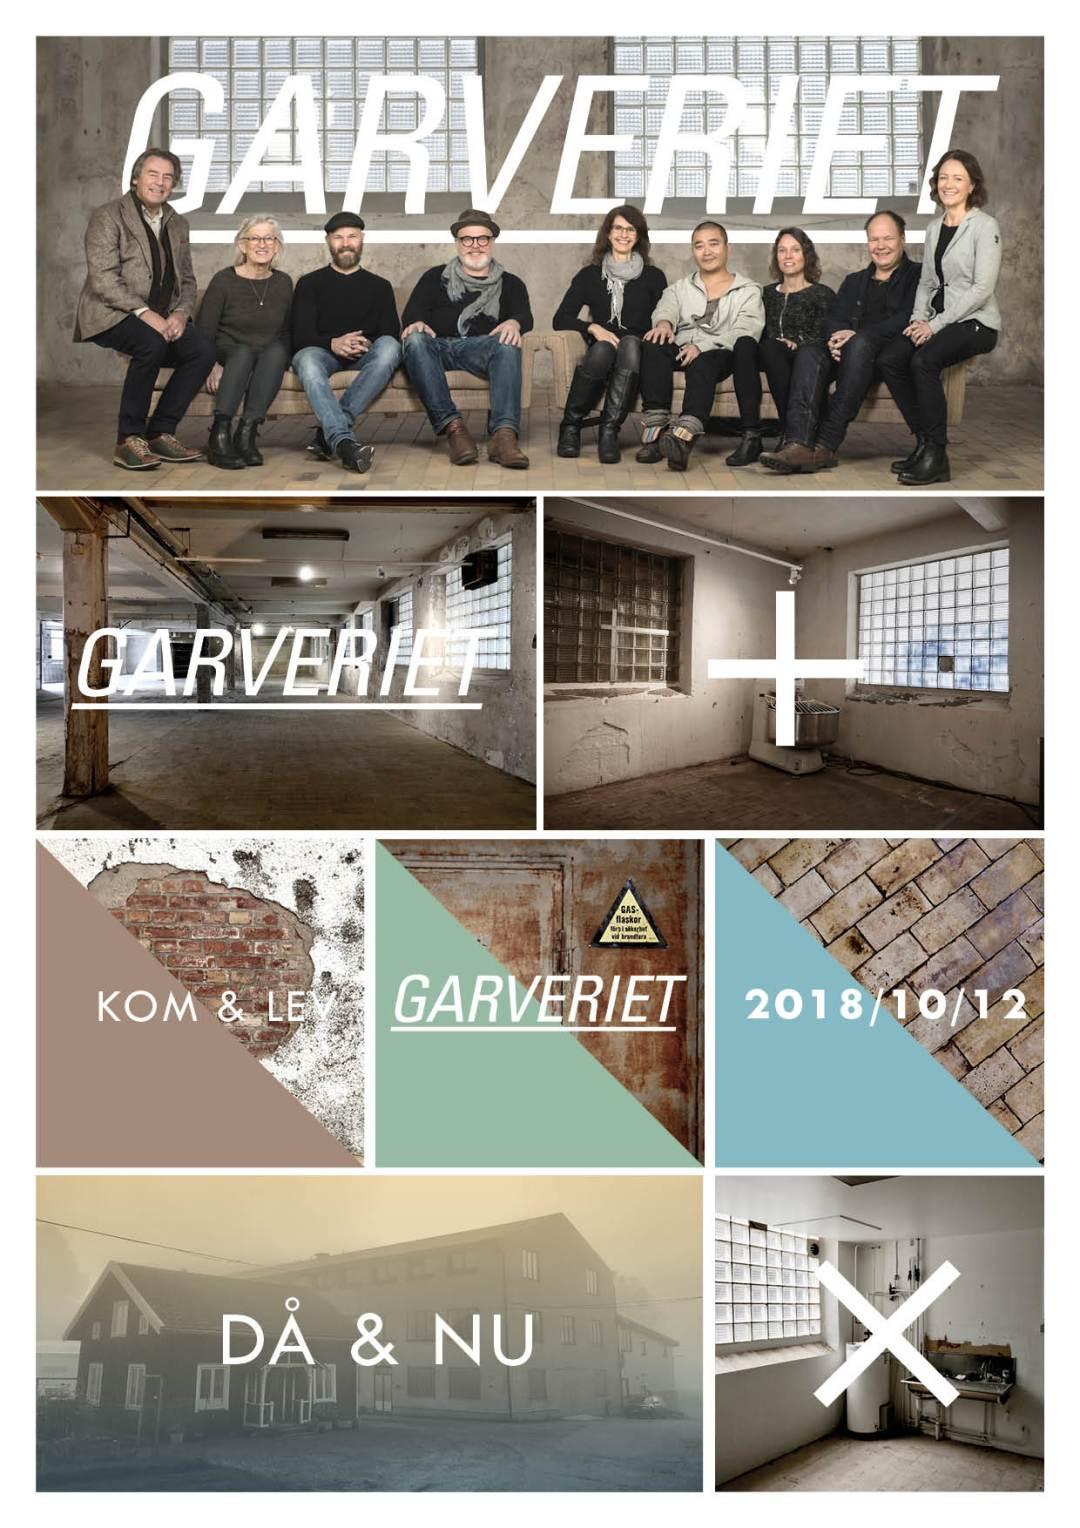 grafisk-profil-garveriet-201811